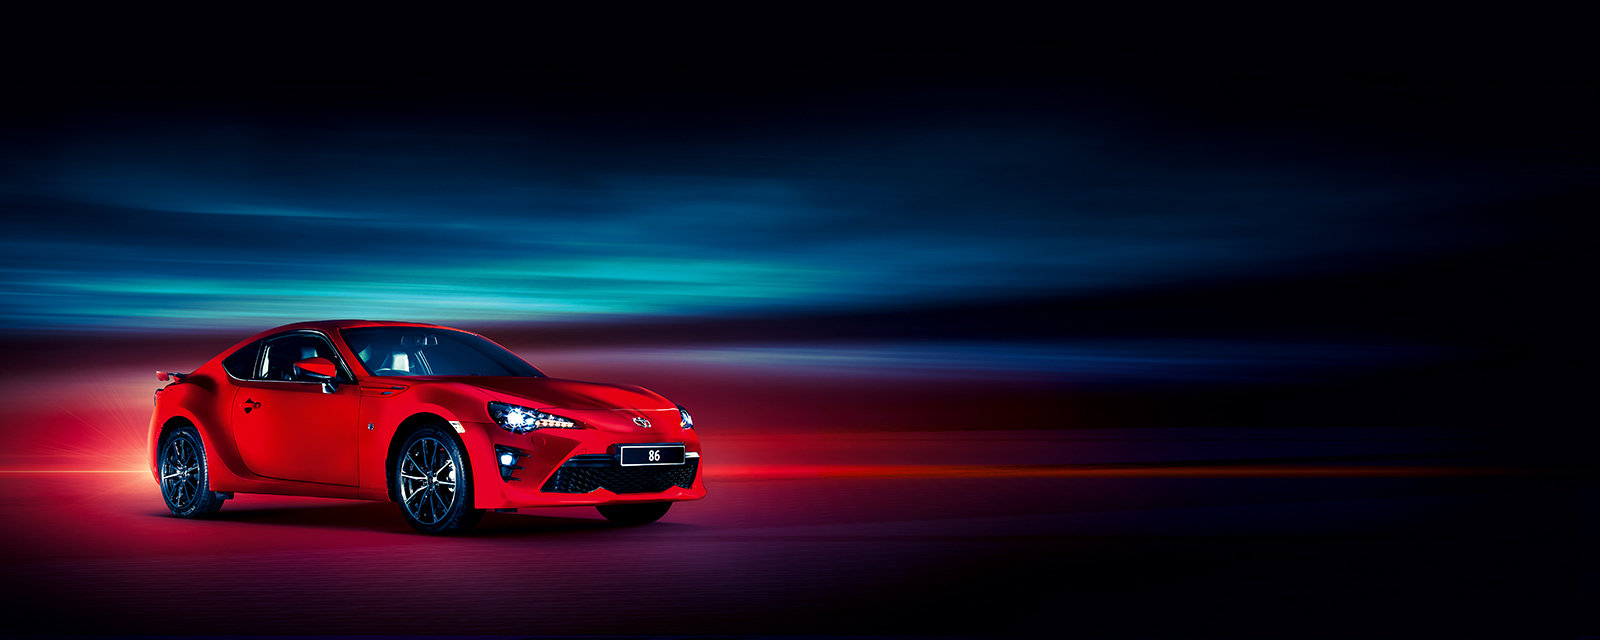 Studio Car Photography